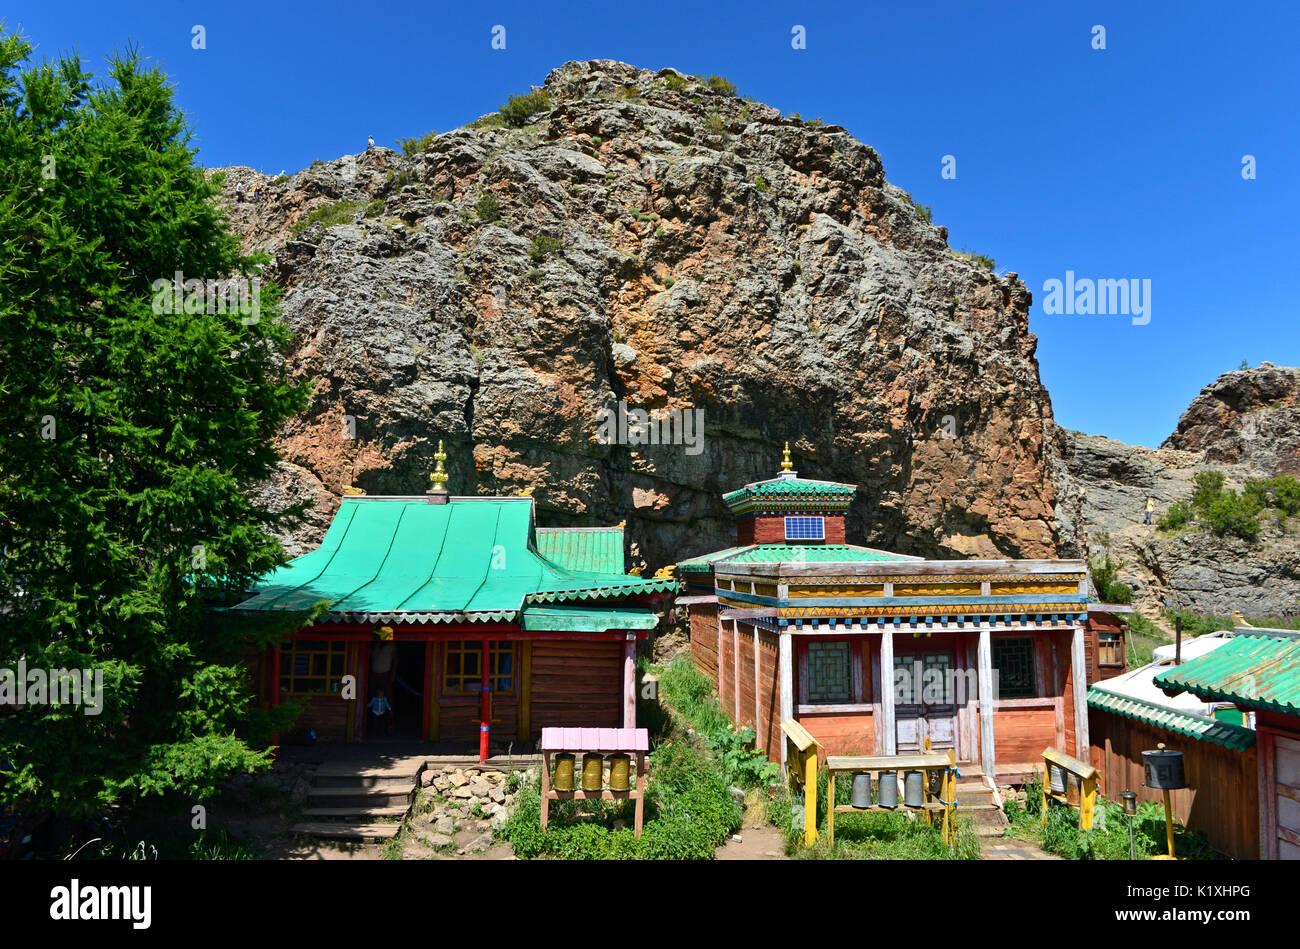 Tuvkhun Monastery, UNESCO world cultural heritage site, Khangai Nuruu National Park, Övörkhangai Province, Mongolia - Stock Image